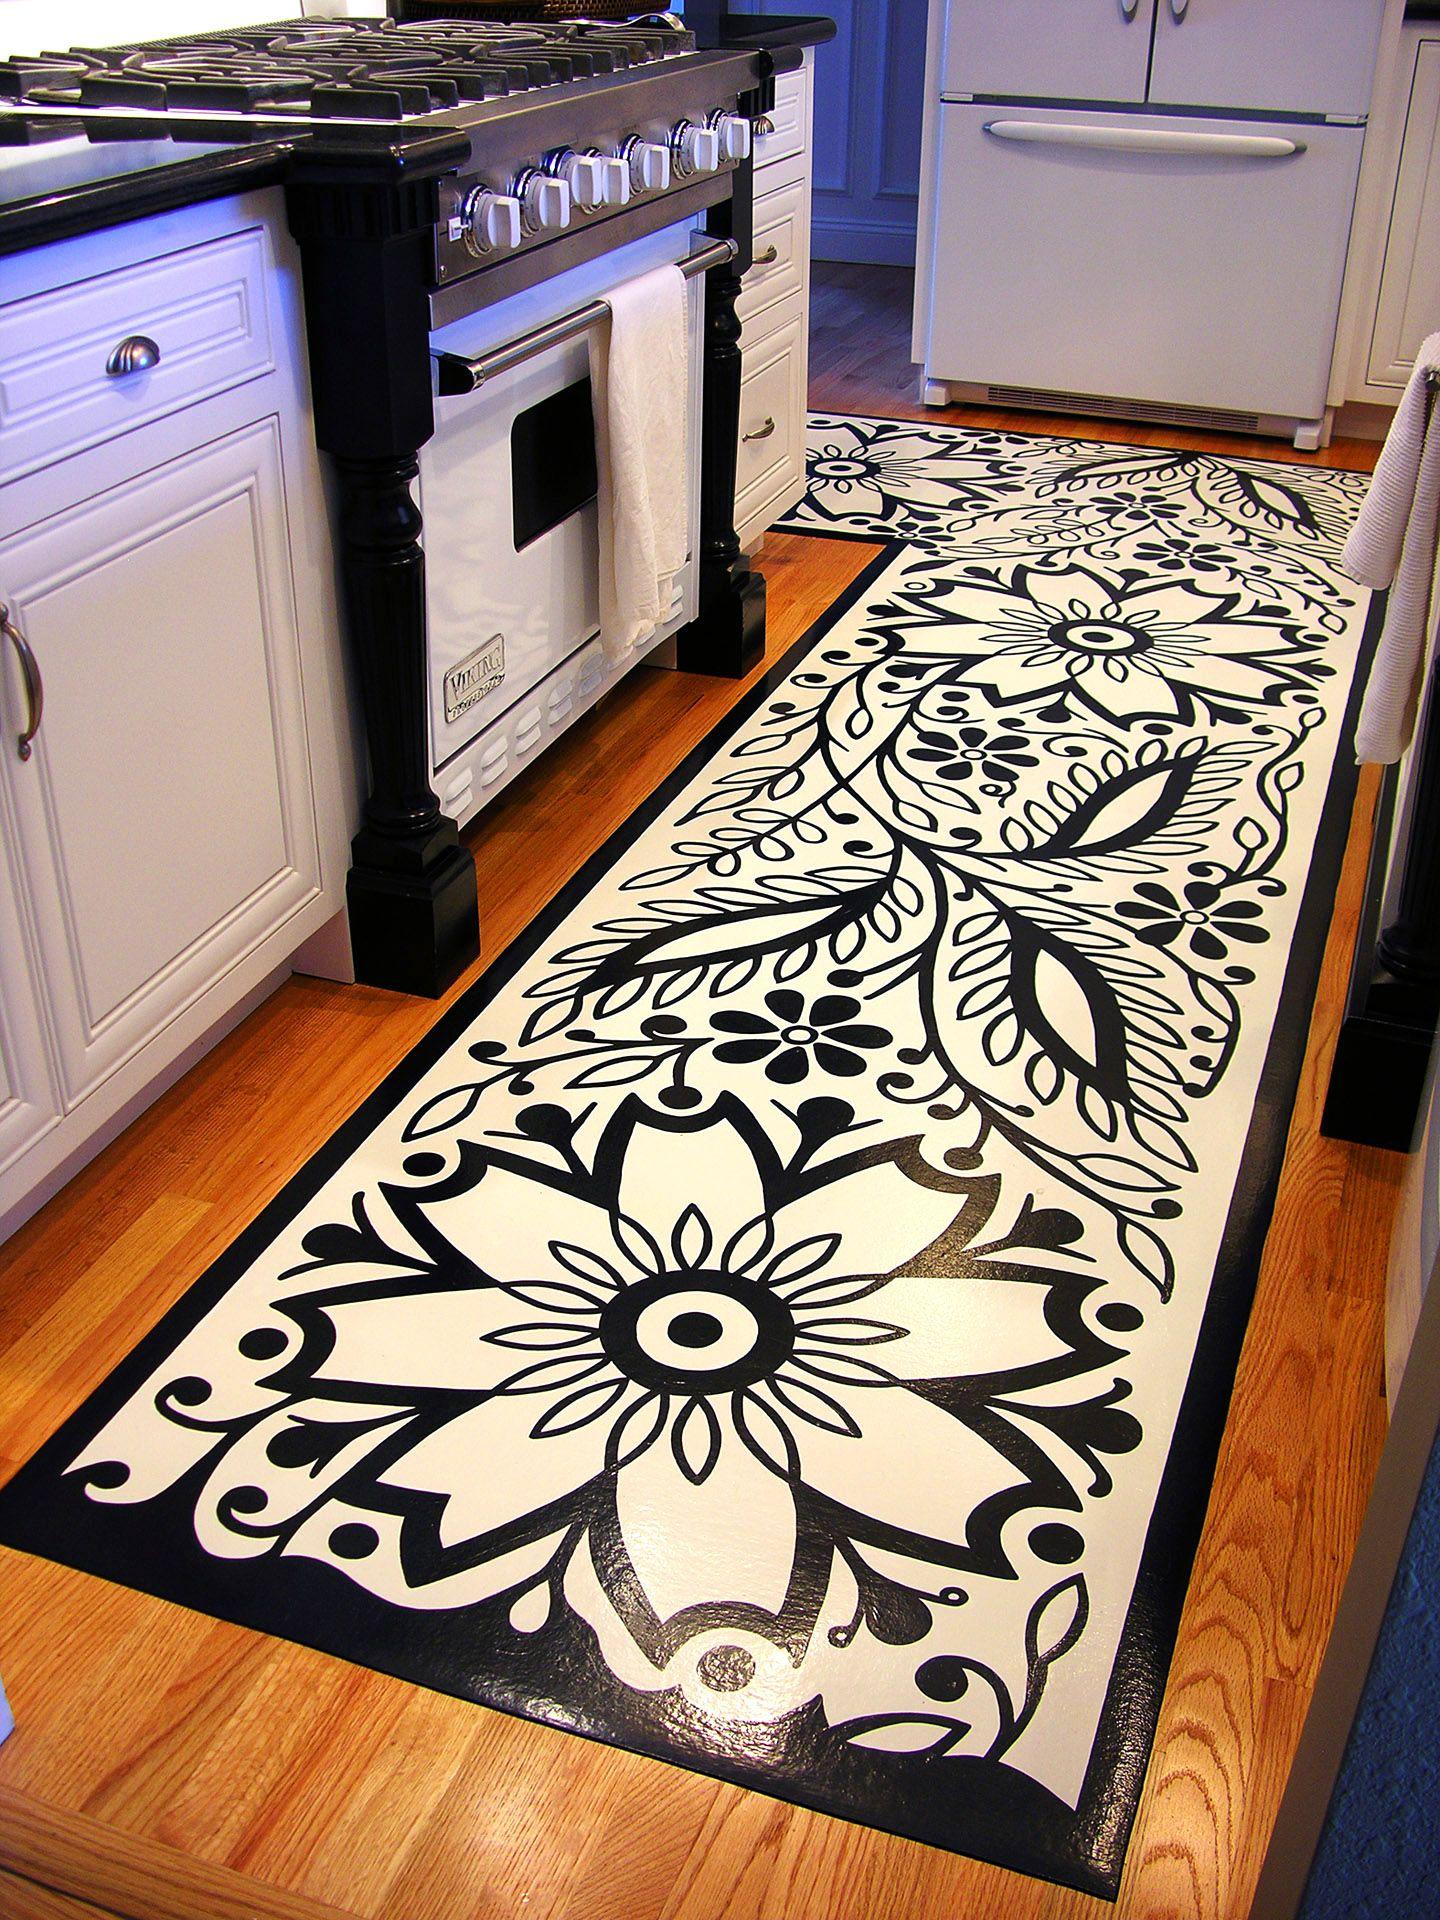 Painted Kitchen Floor Cloths